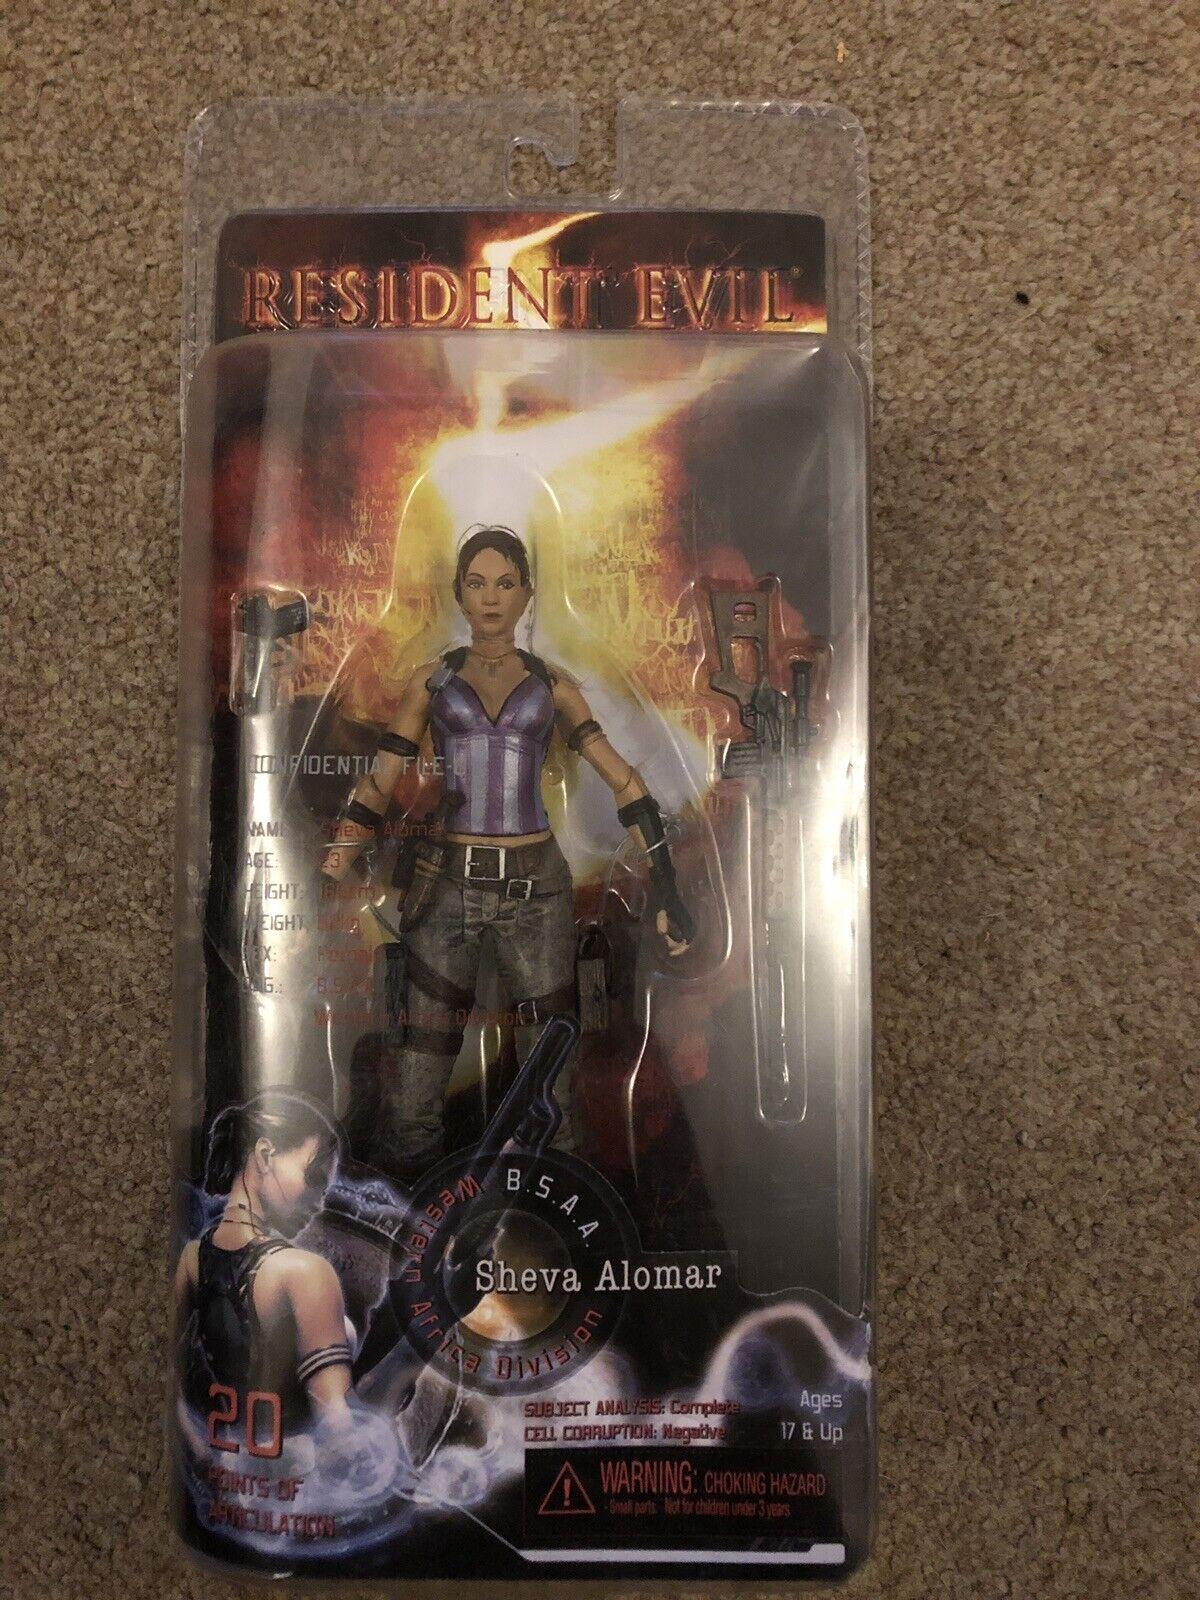 tomar hasta un 70% de descuento Resident Evil 5 Sheva Sheva Sheva Alomar af re 5 1  mejor precio